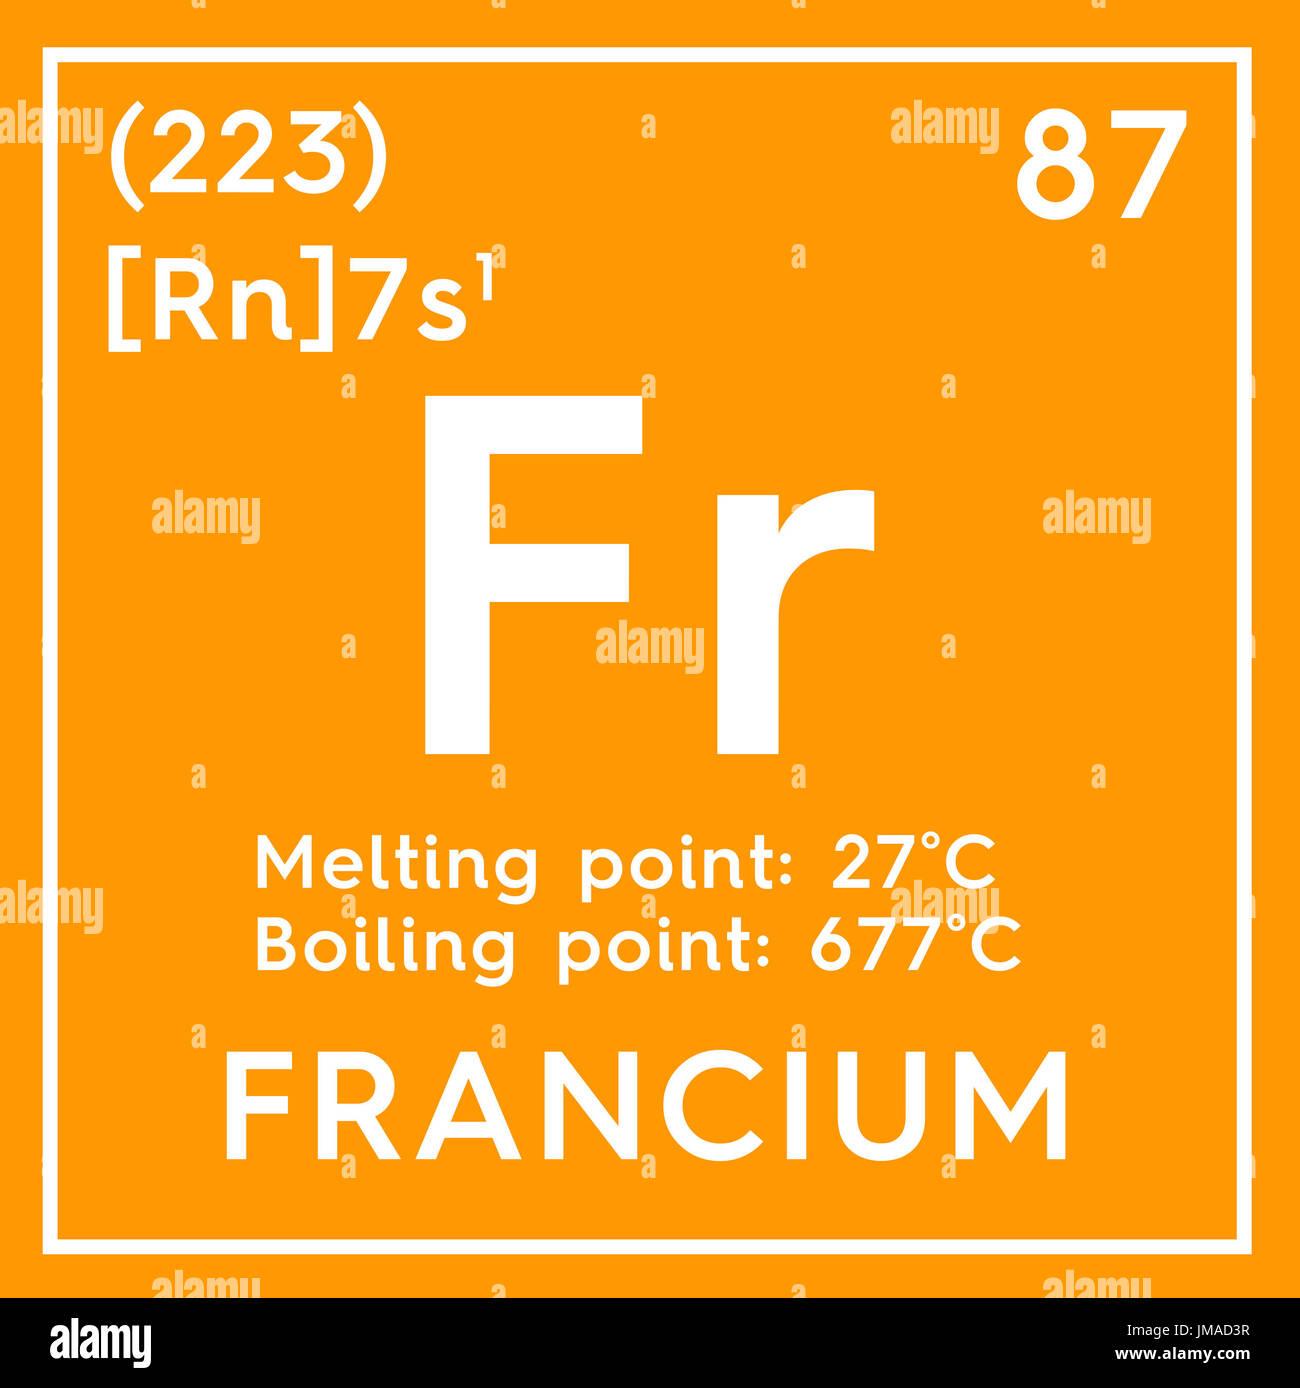 Francio metales alcalinos elemento qumico de la tabla peridica metales alcalinos elemento qumico de la tabla peridica de mendeleyev francio en square cube concepto creativo urtaz Choice Image